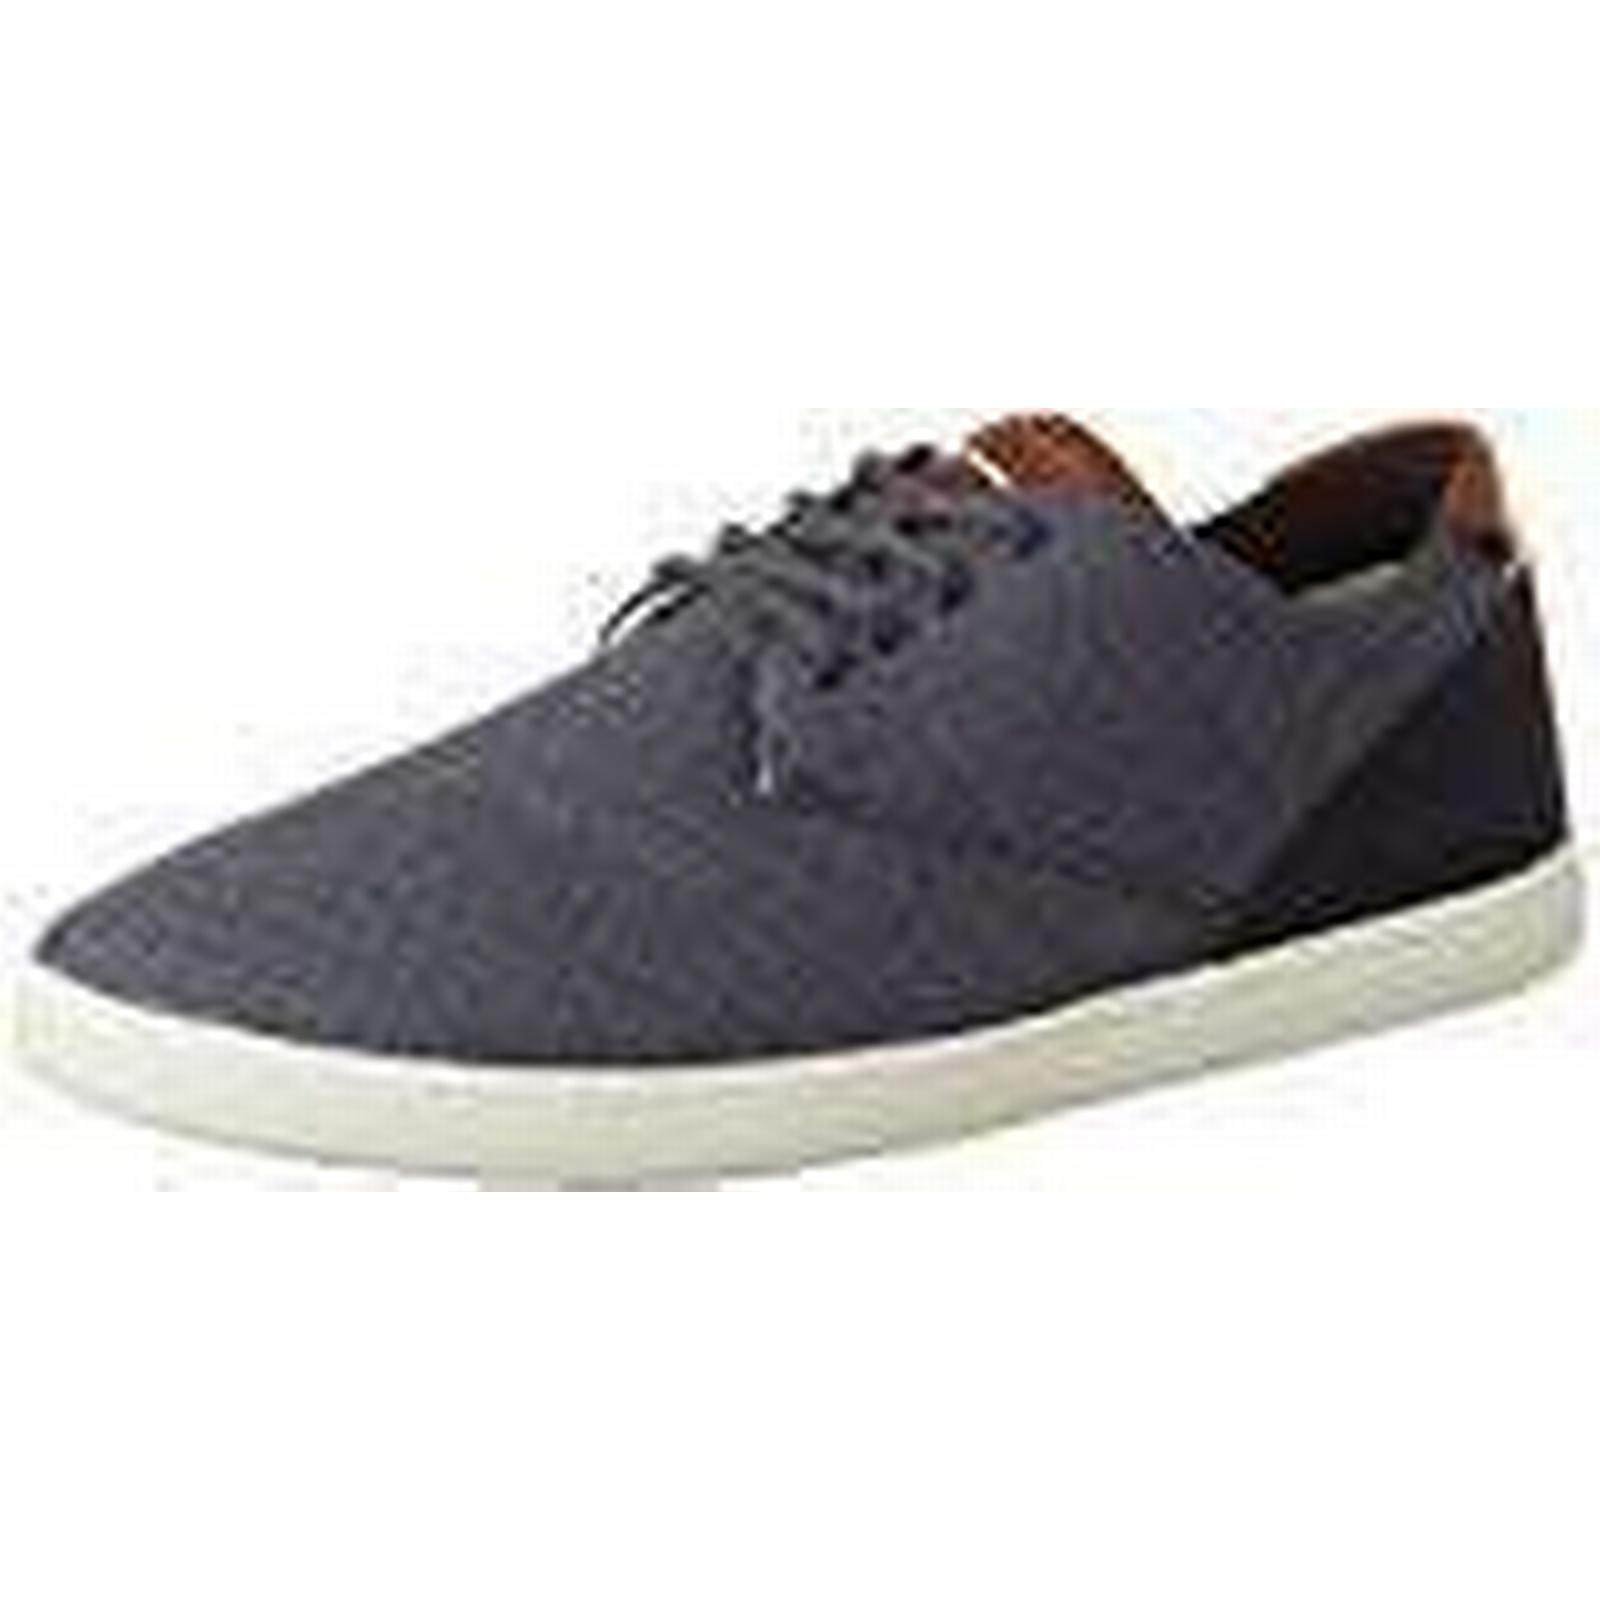 Boxfresh Men's 9 Henning Ch Slub/SDE NVY Low-Top Sneakers (Blue), 9 Men's UK 43 EU 343962